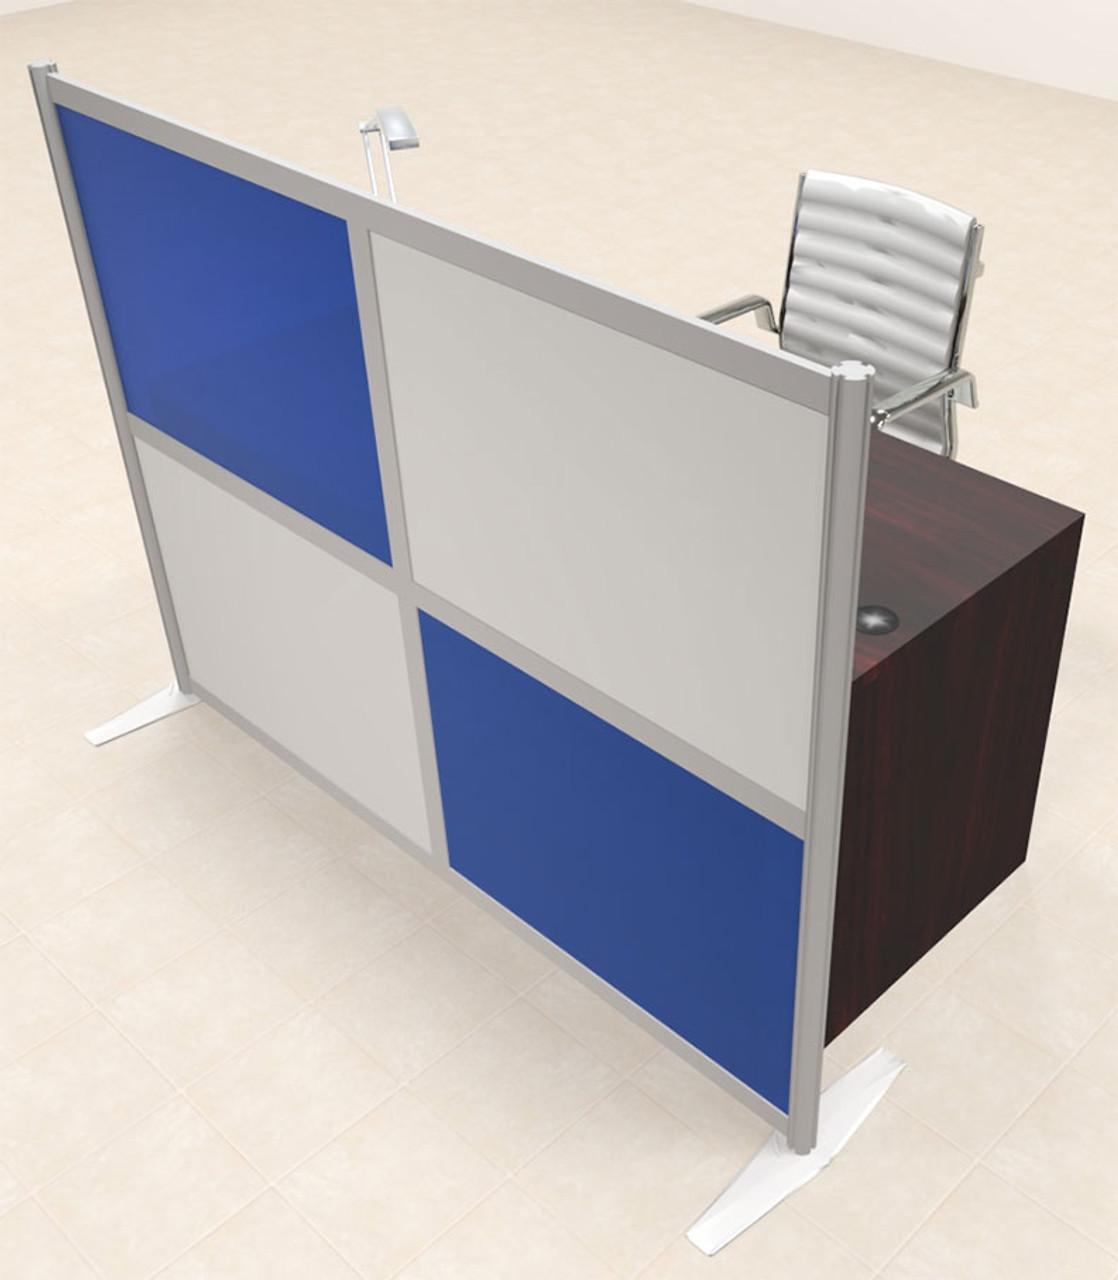 One Person Workstation w/Acrylic Aluminum Privacy Panel, #OT-SUL-HPB63